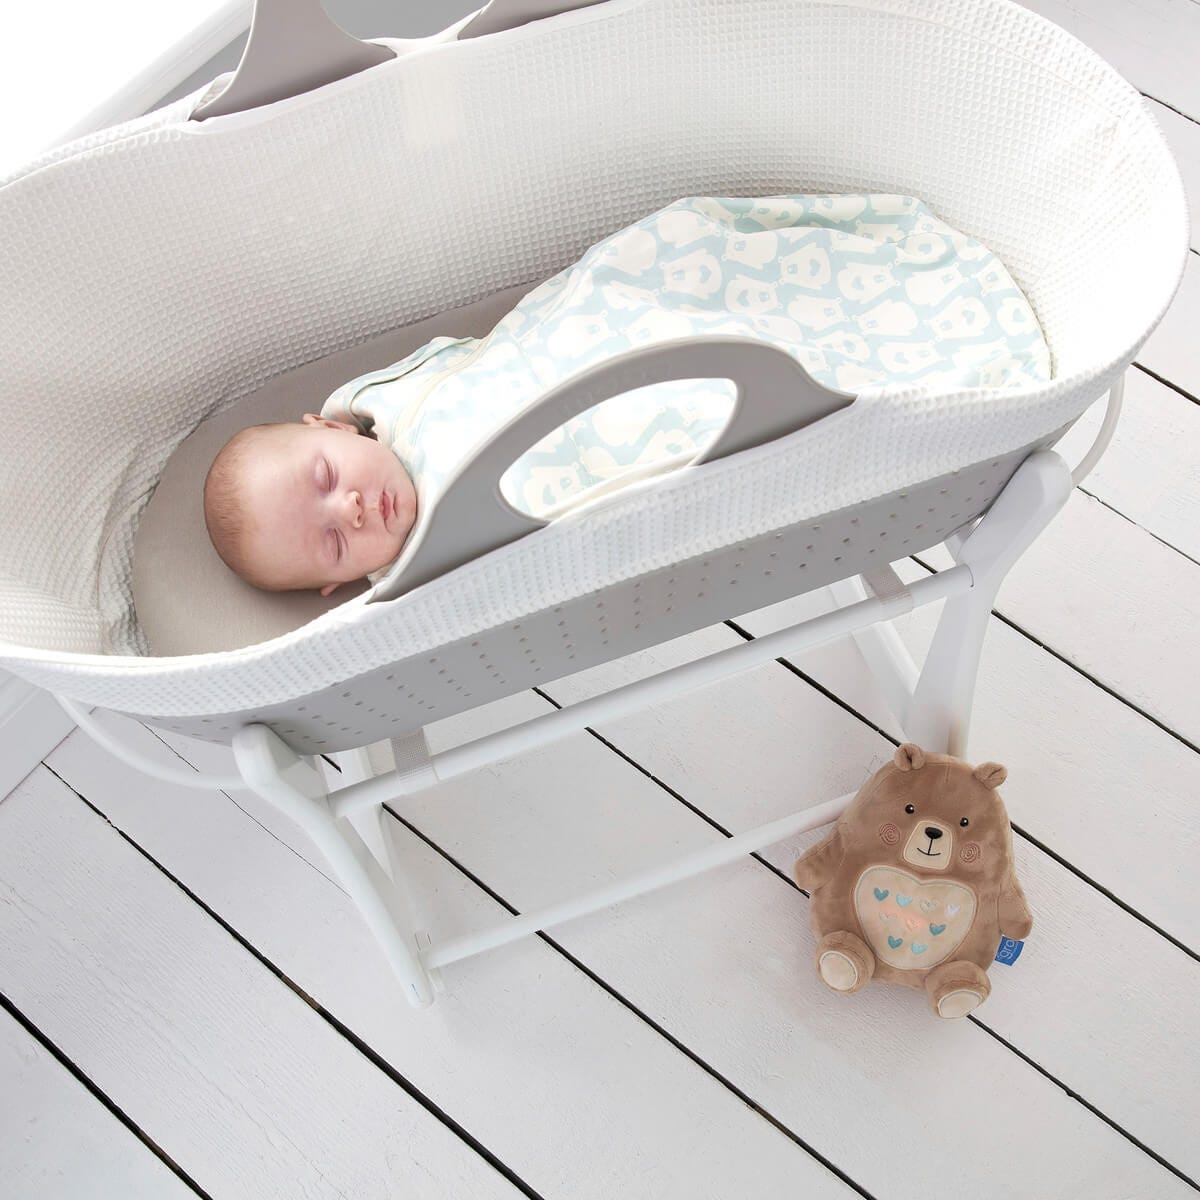 baby-asleep-in-sleepee-basket-wearing-bennie-grosnug